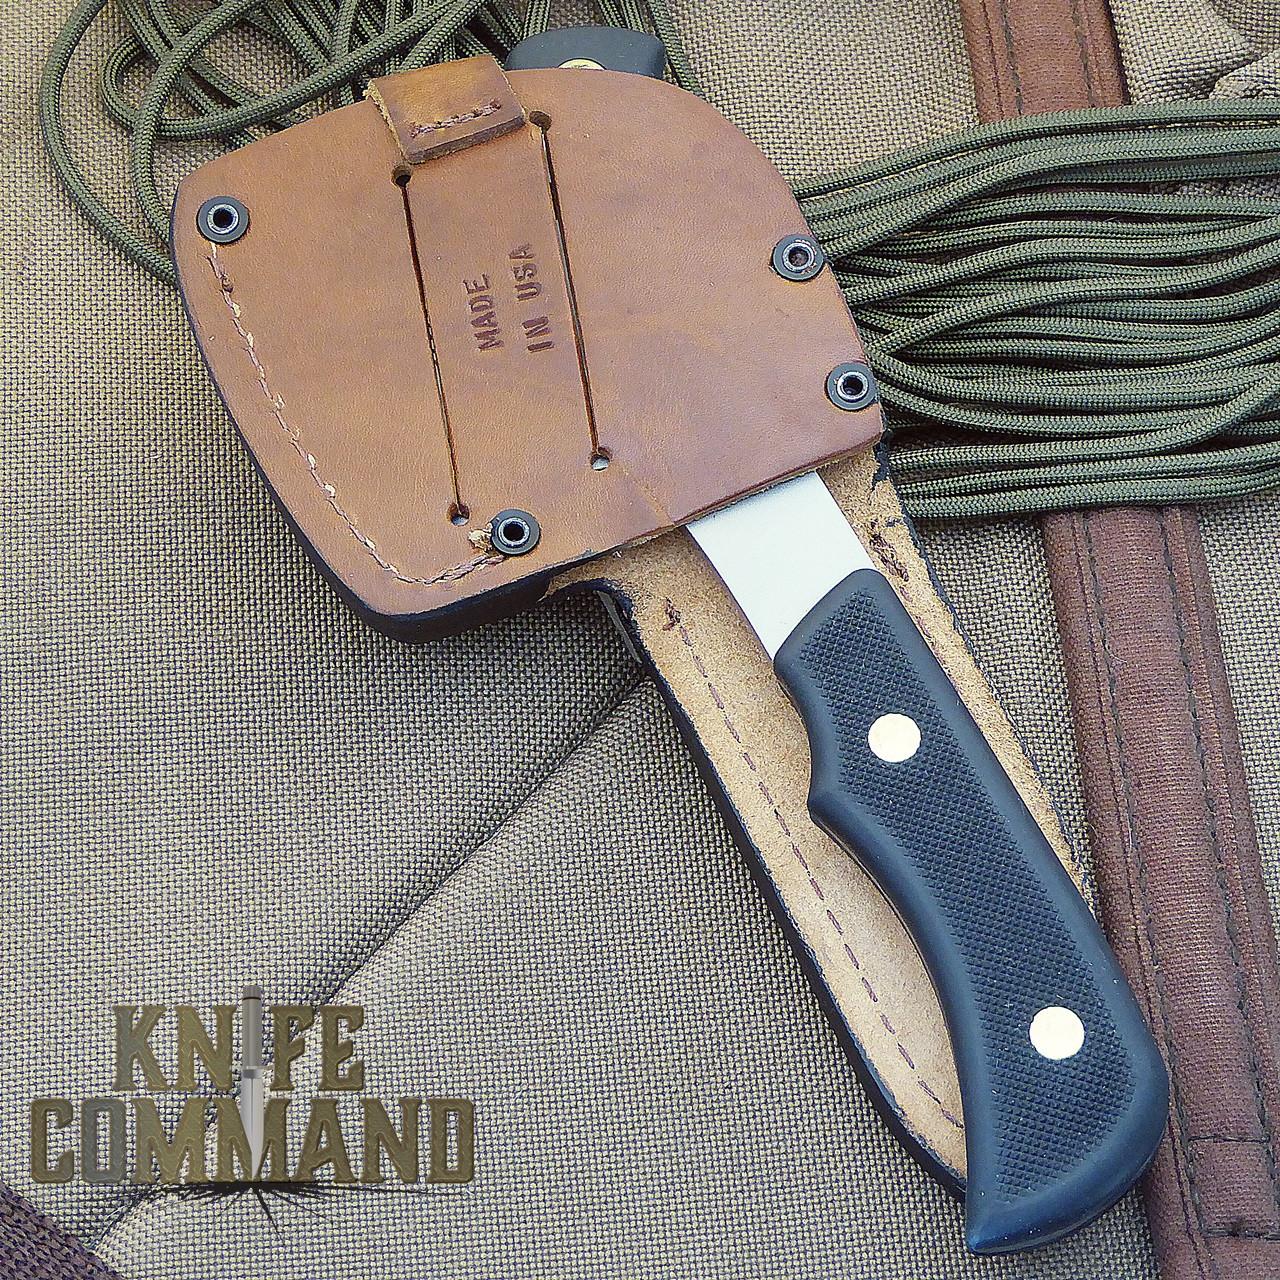 Knives of Alaska Bobcat Mini Hatchet Alpha Wolf Hunting Knife Combo.  Carried easily on your belt.